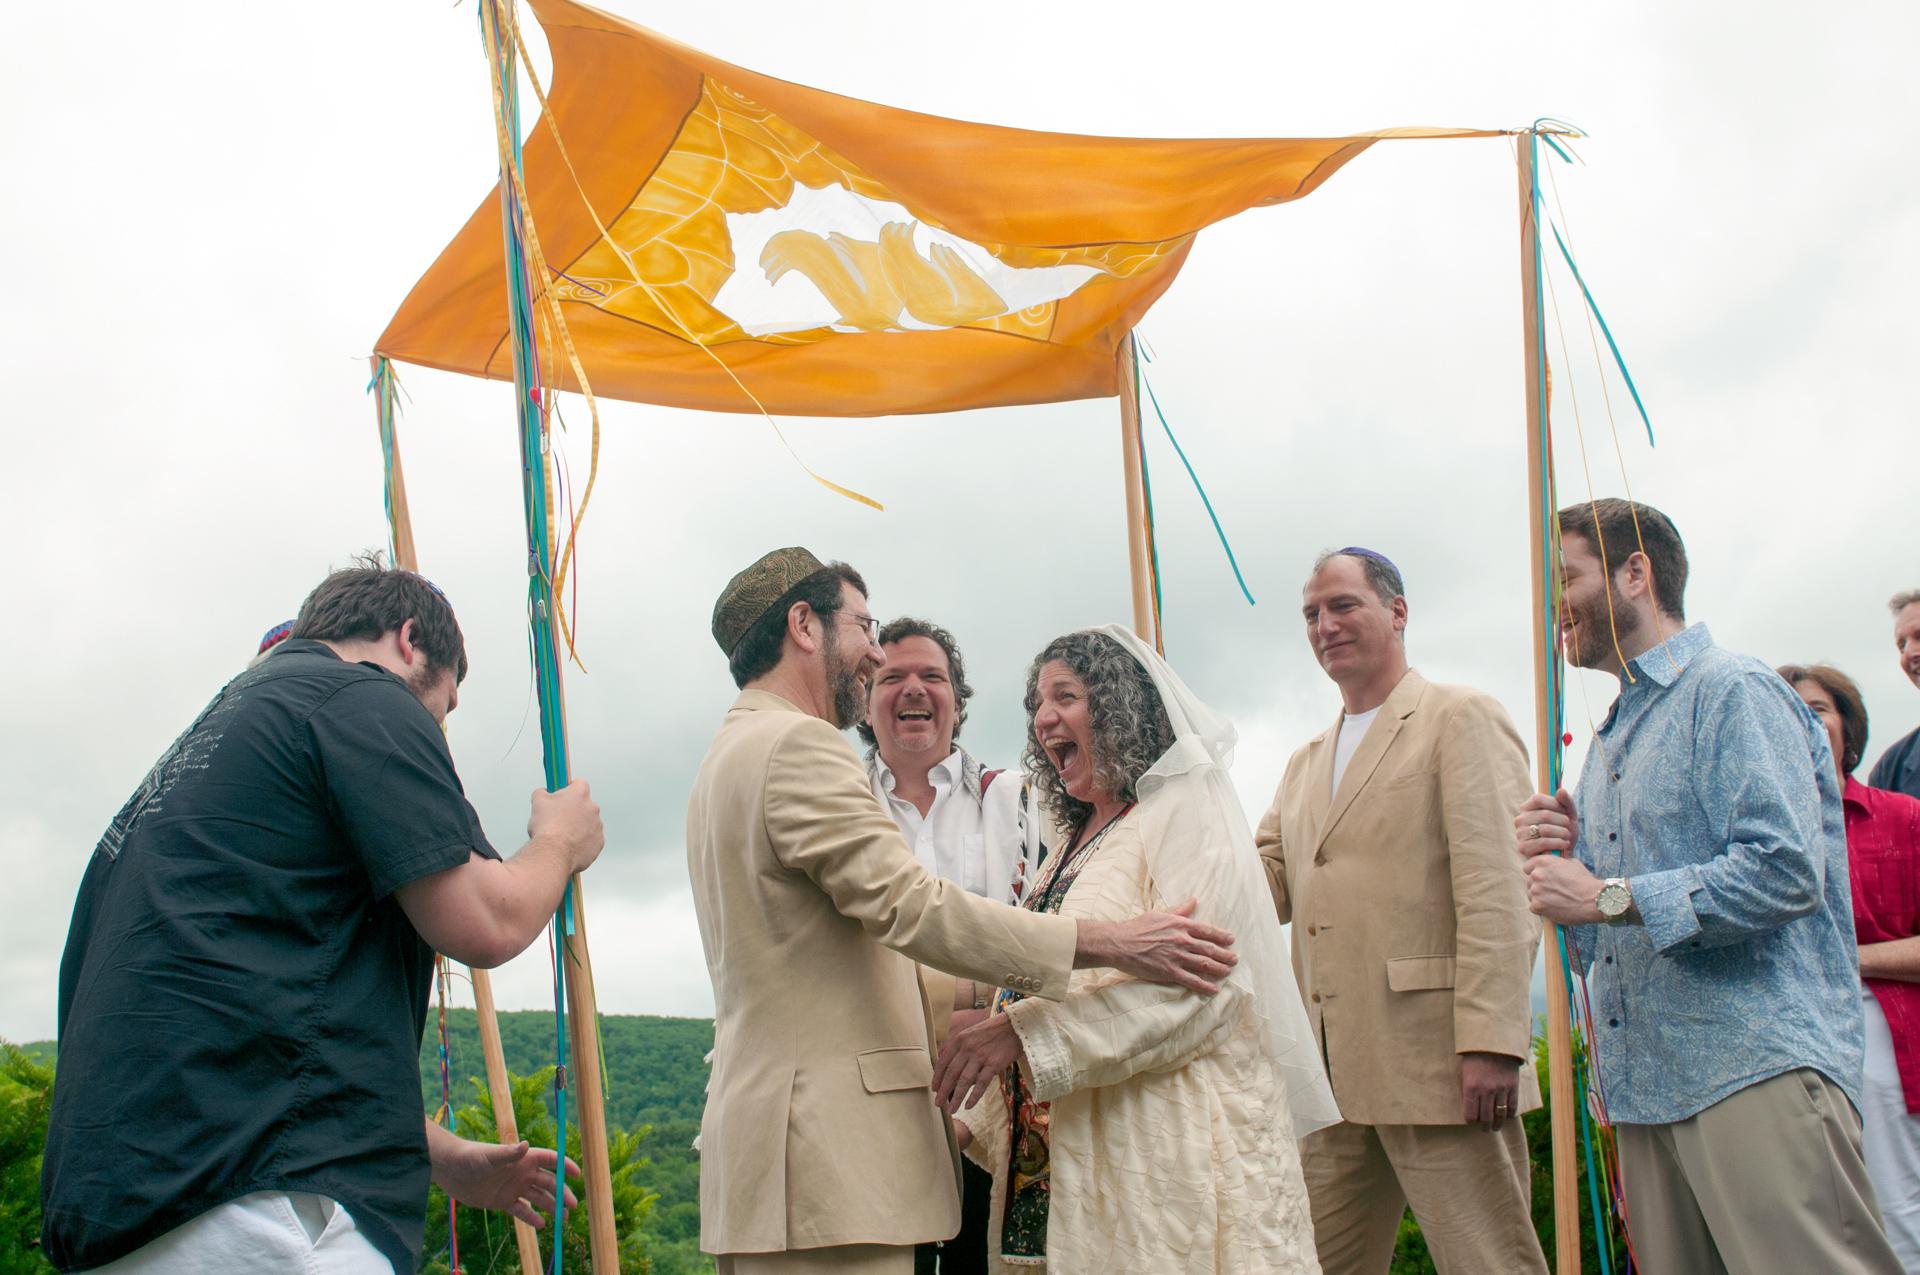 Outdoor Jewish Wedding at Warfield House